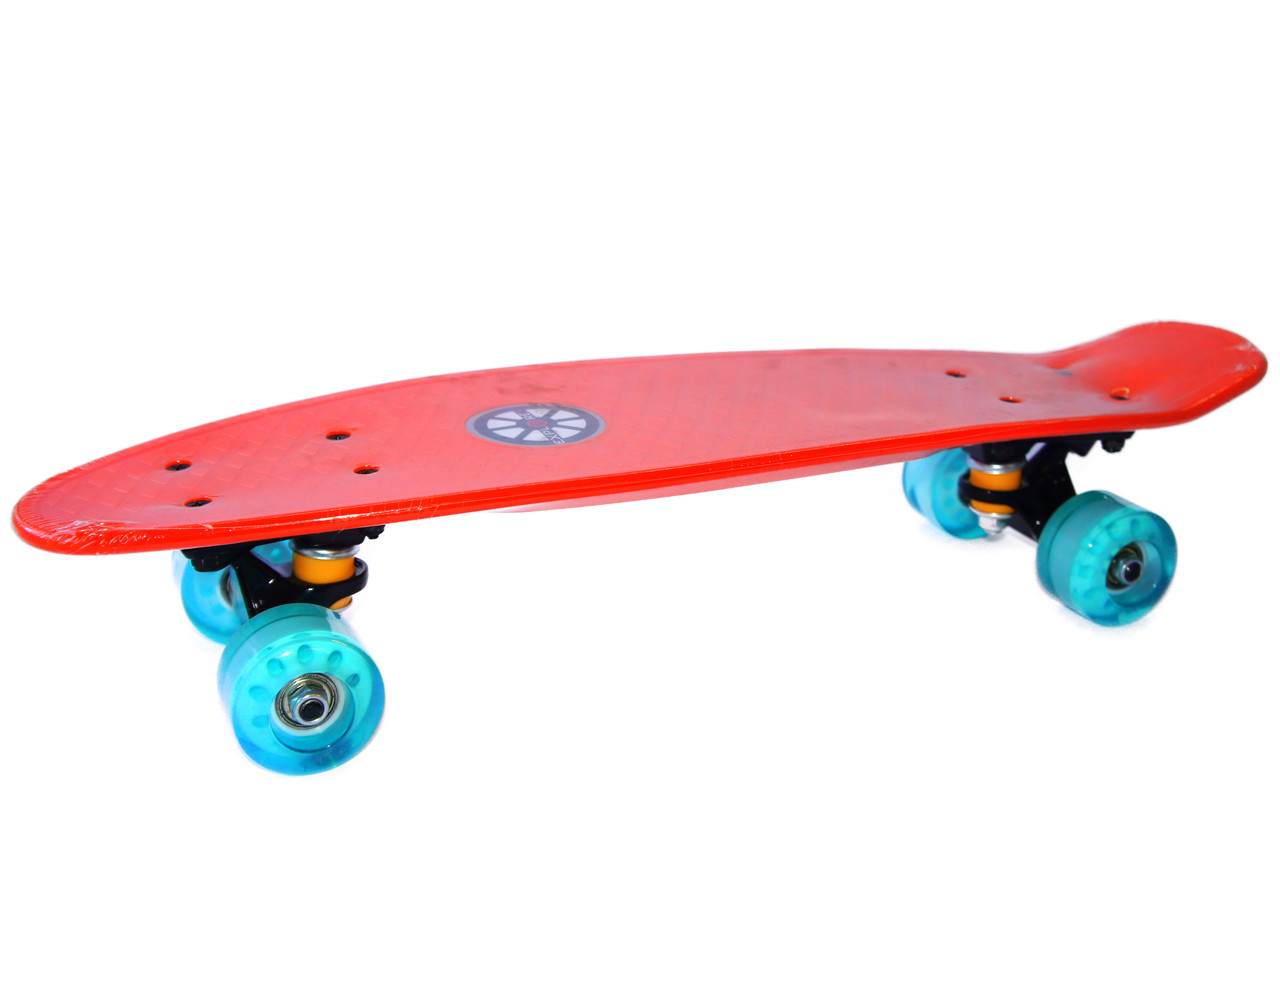 Пенни борд Скейтборд Explore Penny Board VIBRO 22 Гарантия Обслуживание